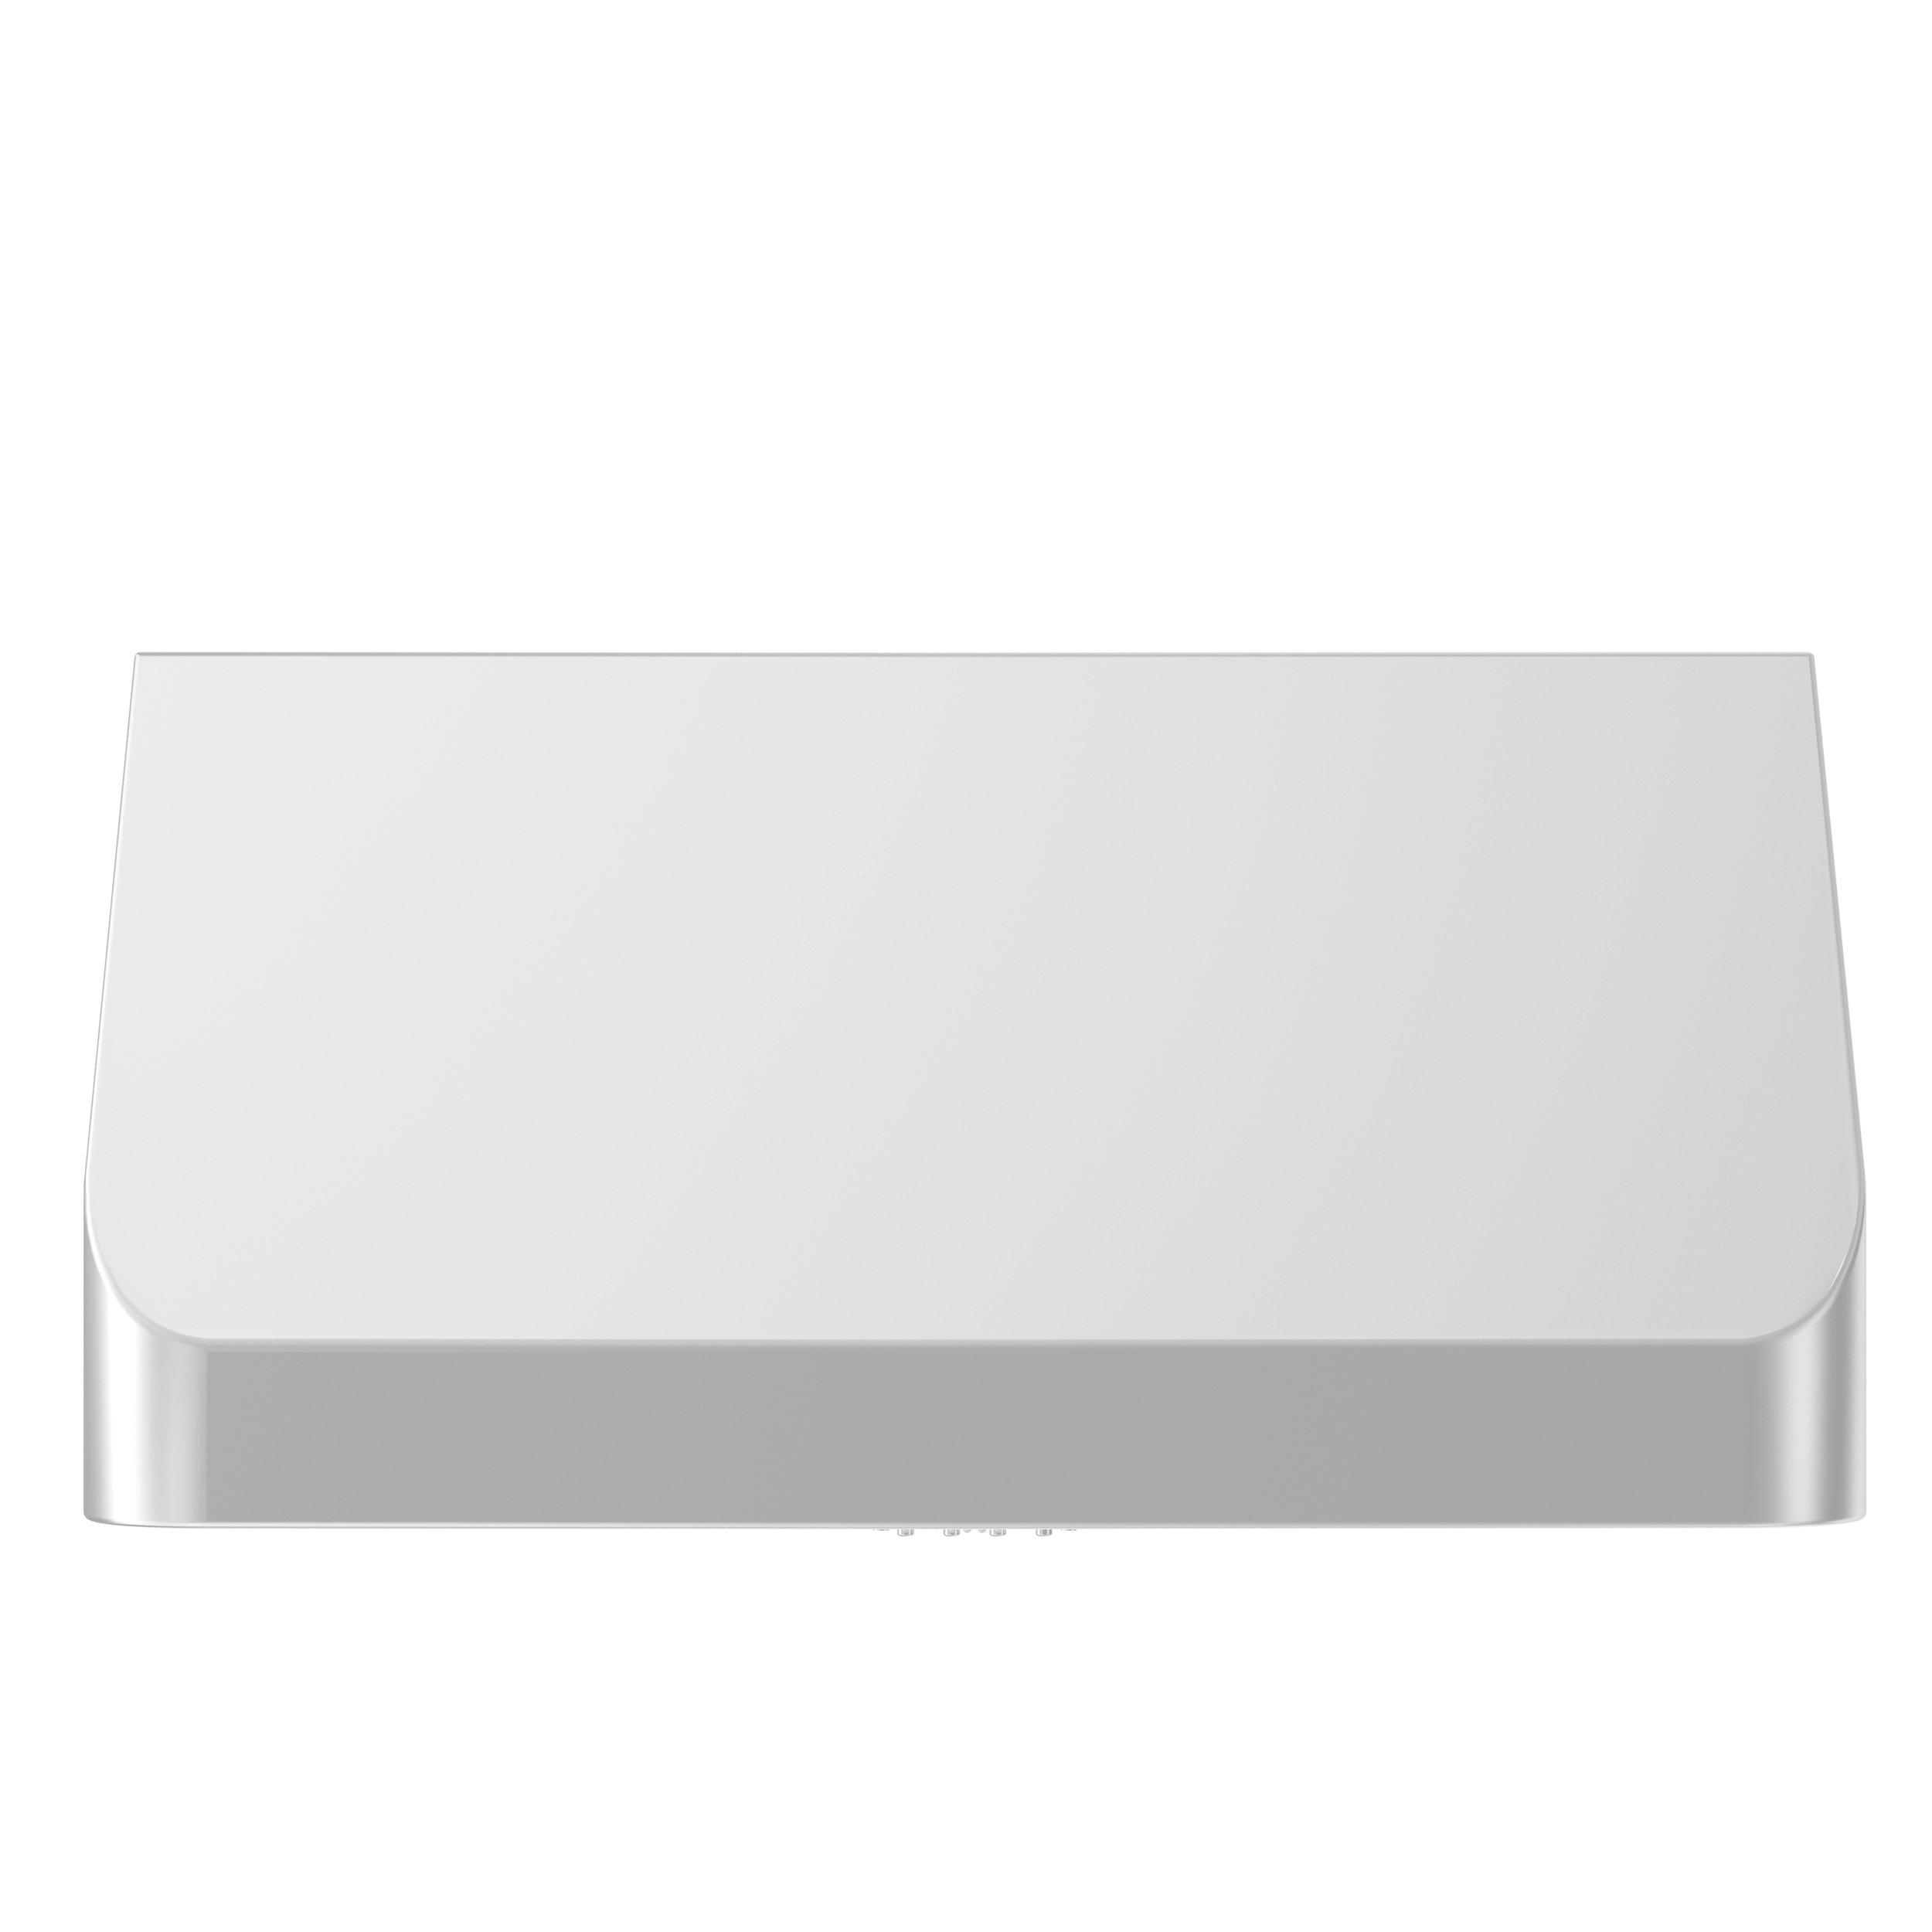 zline-stainless-steel-under-cabinet-range-hood-520-front.jpeg